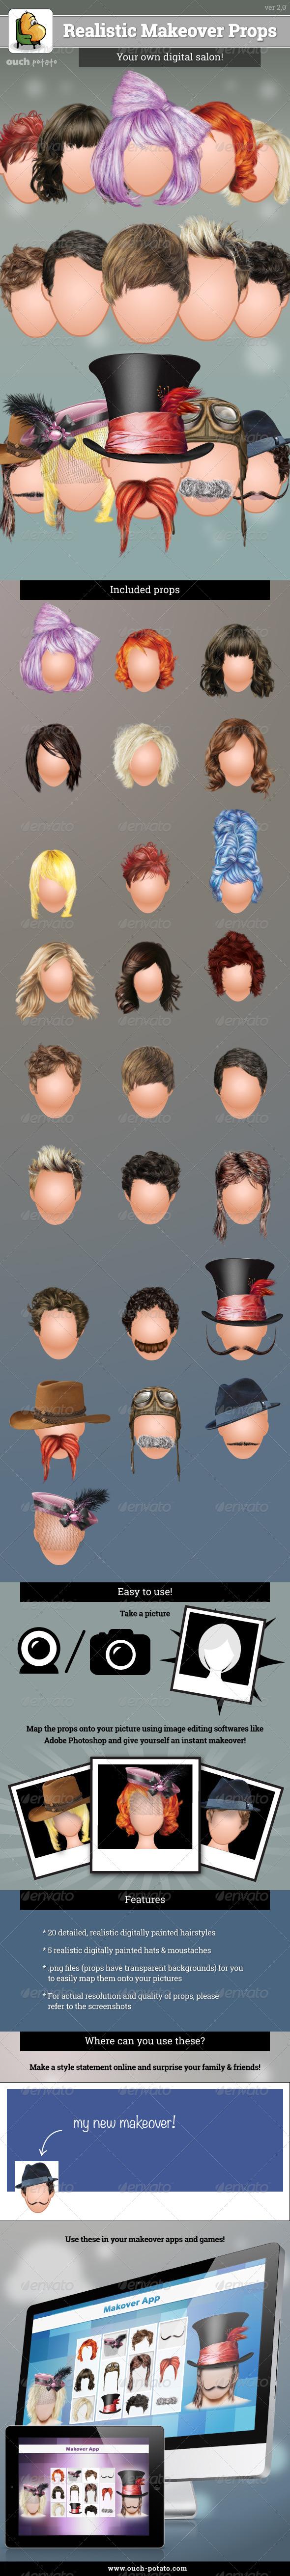 GraphicRiver 30 Realistic Makeover Props 5344151